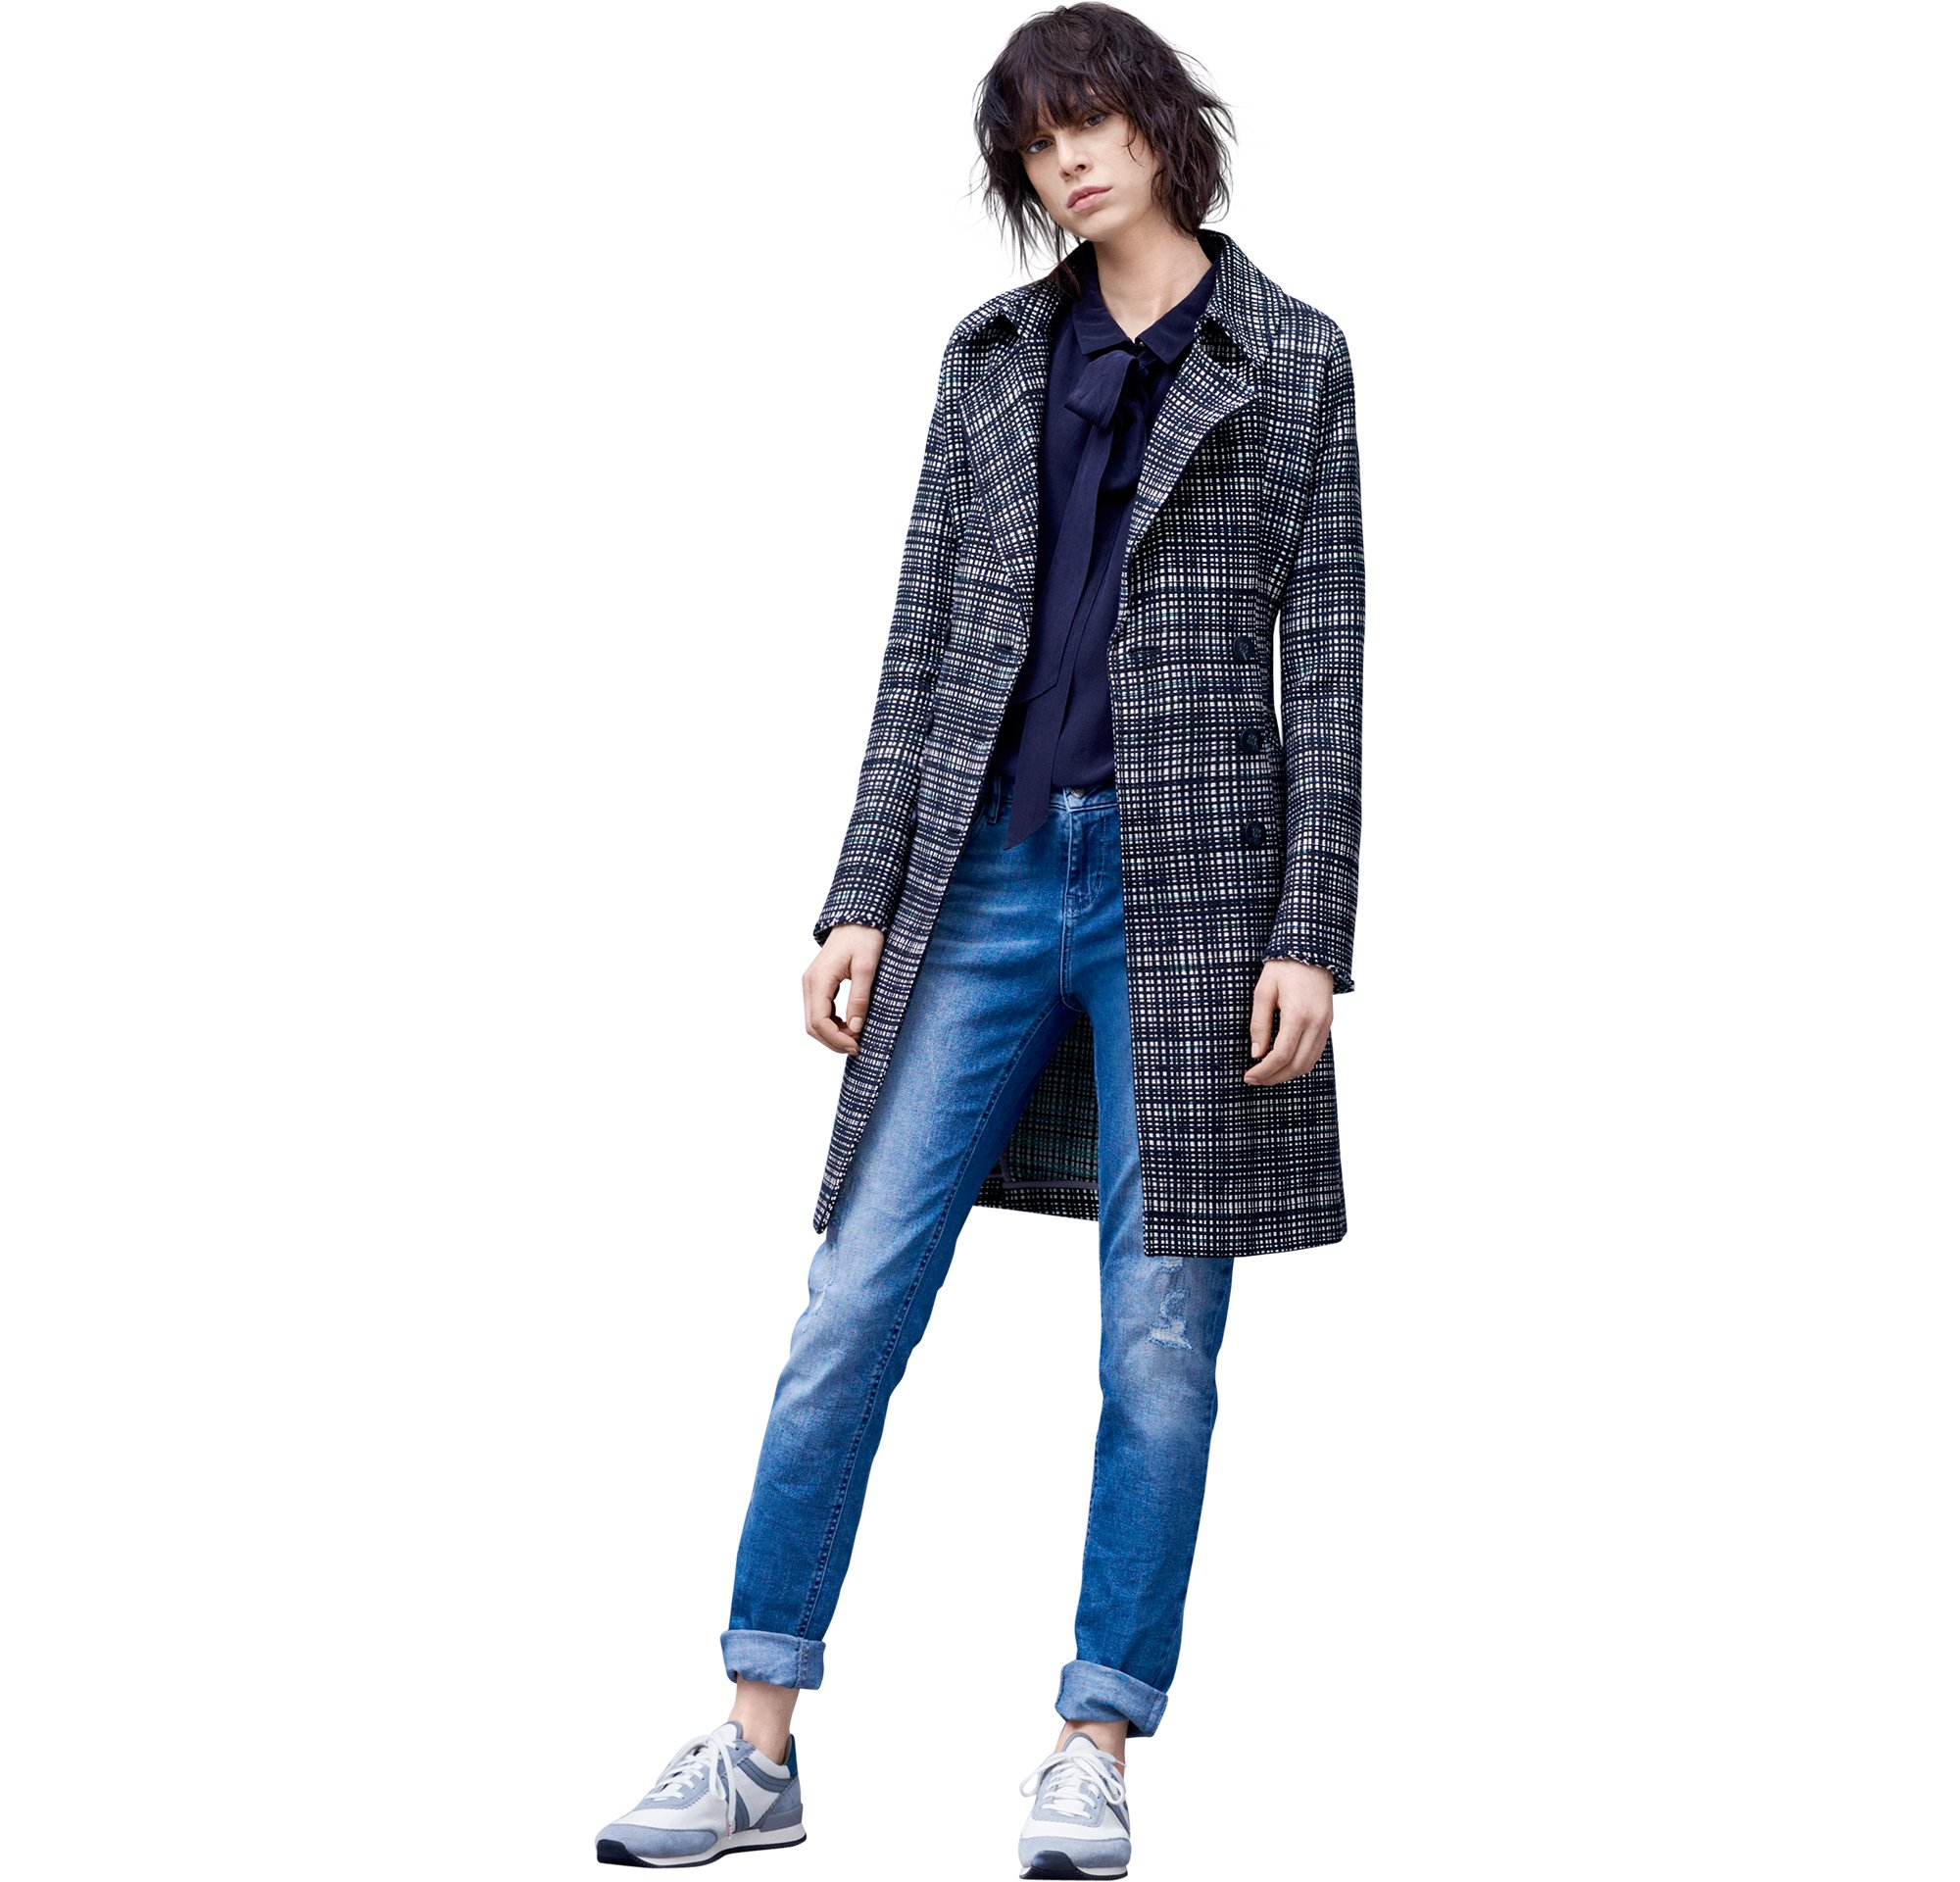 Coat, pullover, jeans by BOSS Orange